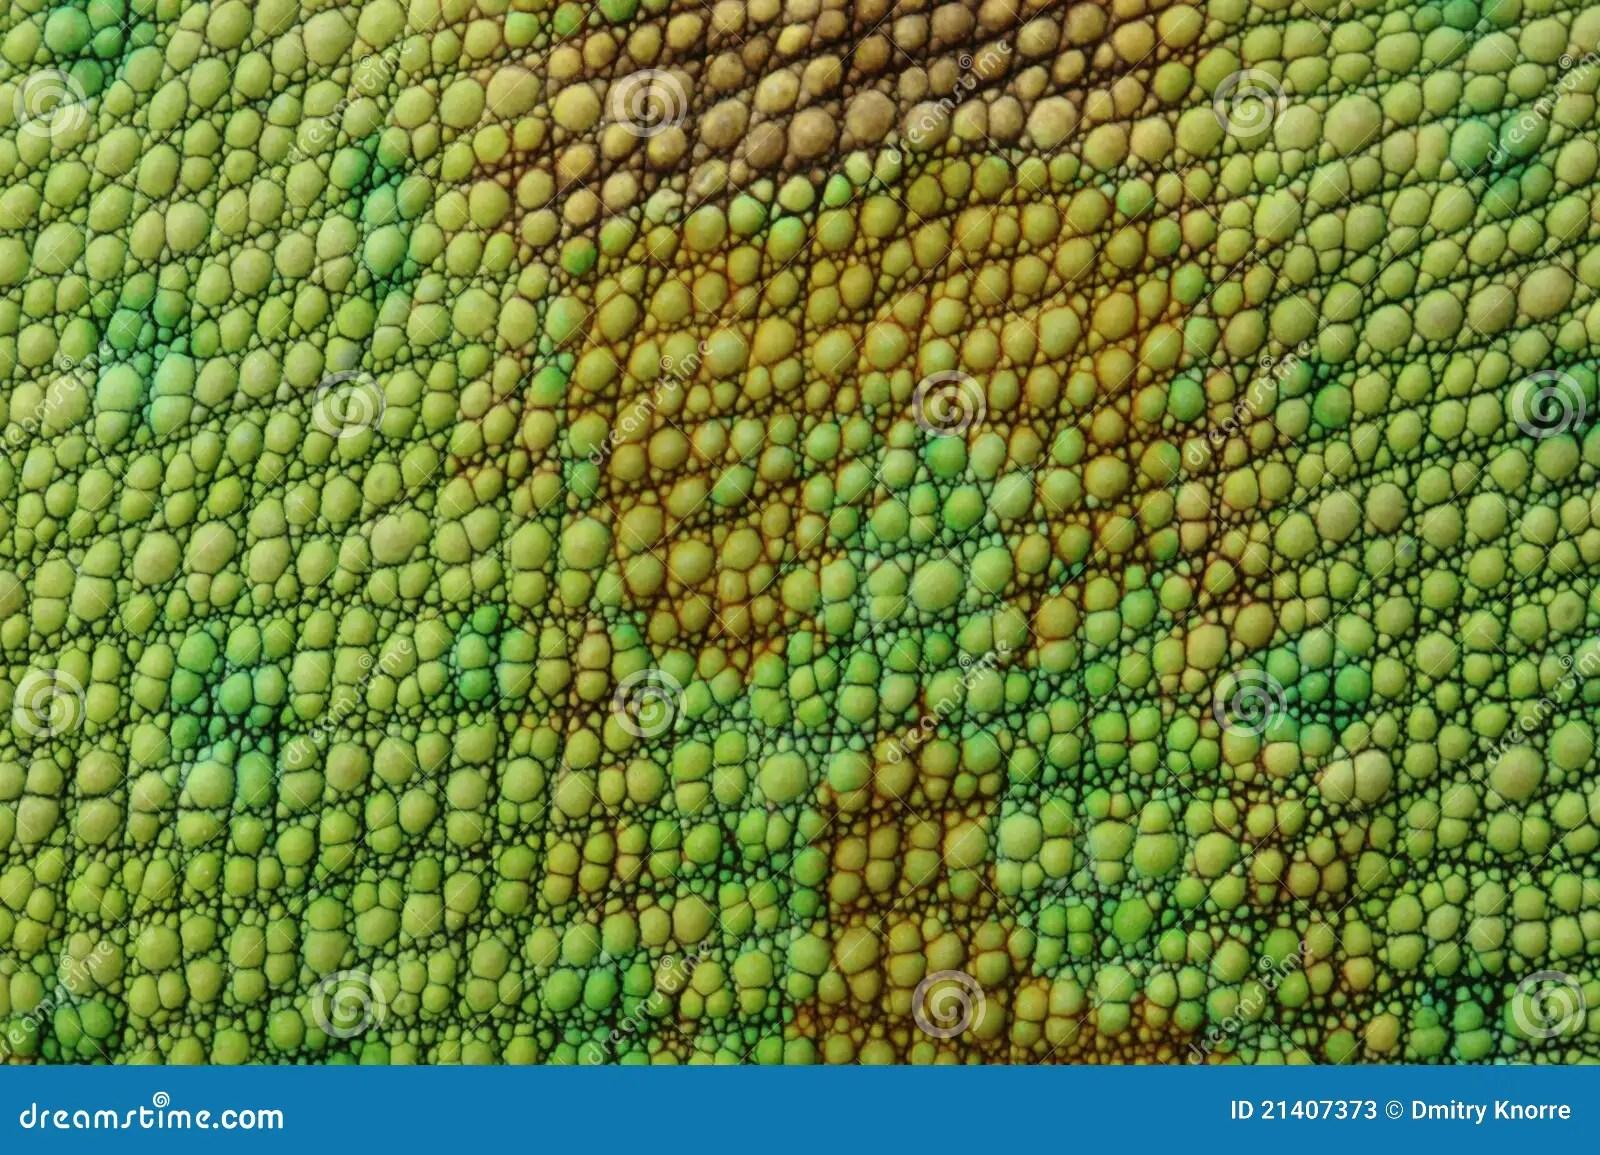 Green Animal Print Wallpaper Lizard Skin Stock Image Image Of Texture Dragon Nature